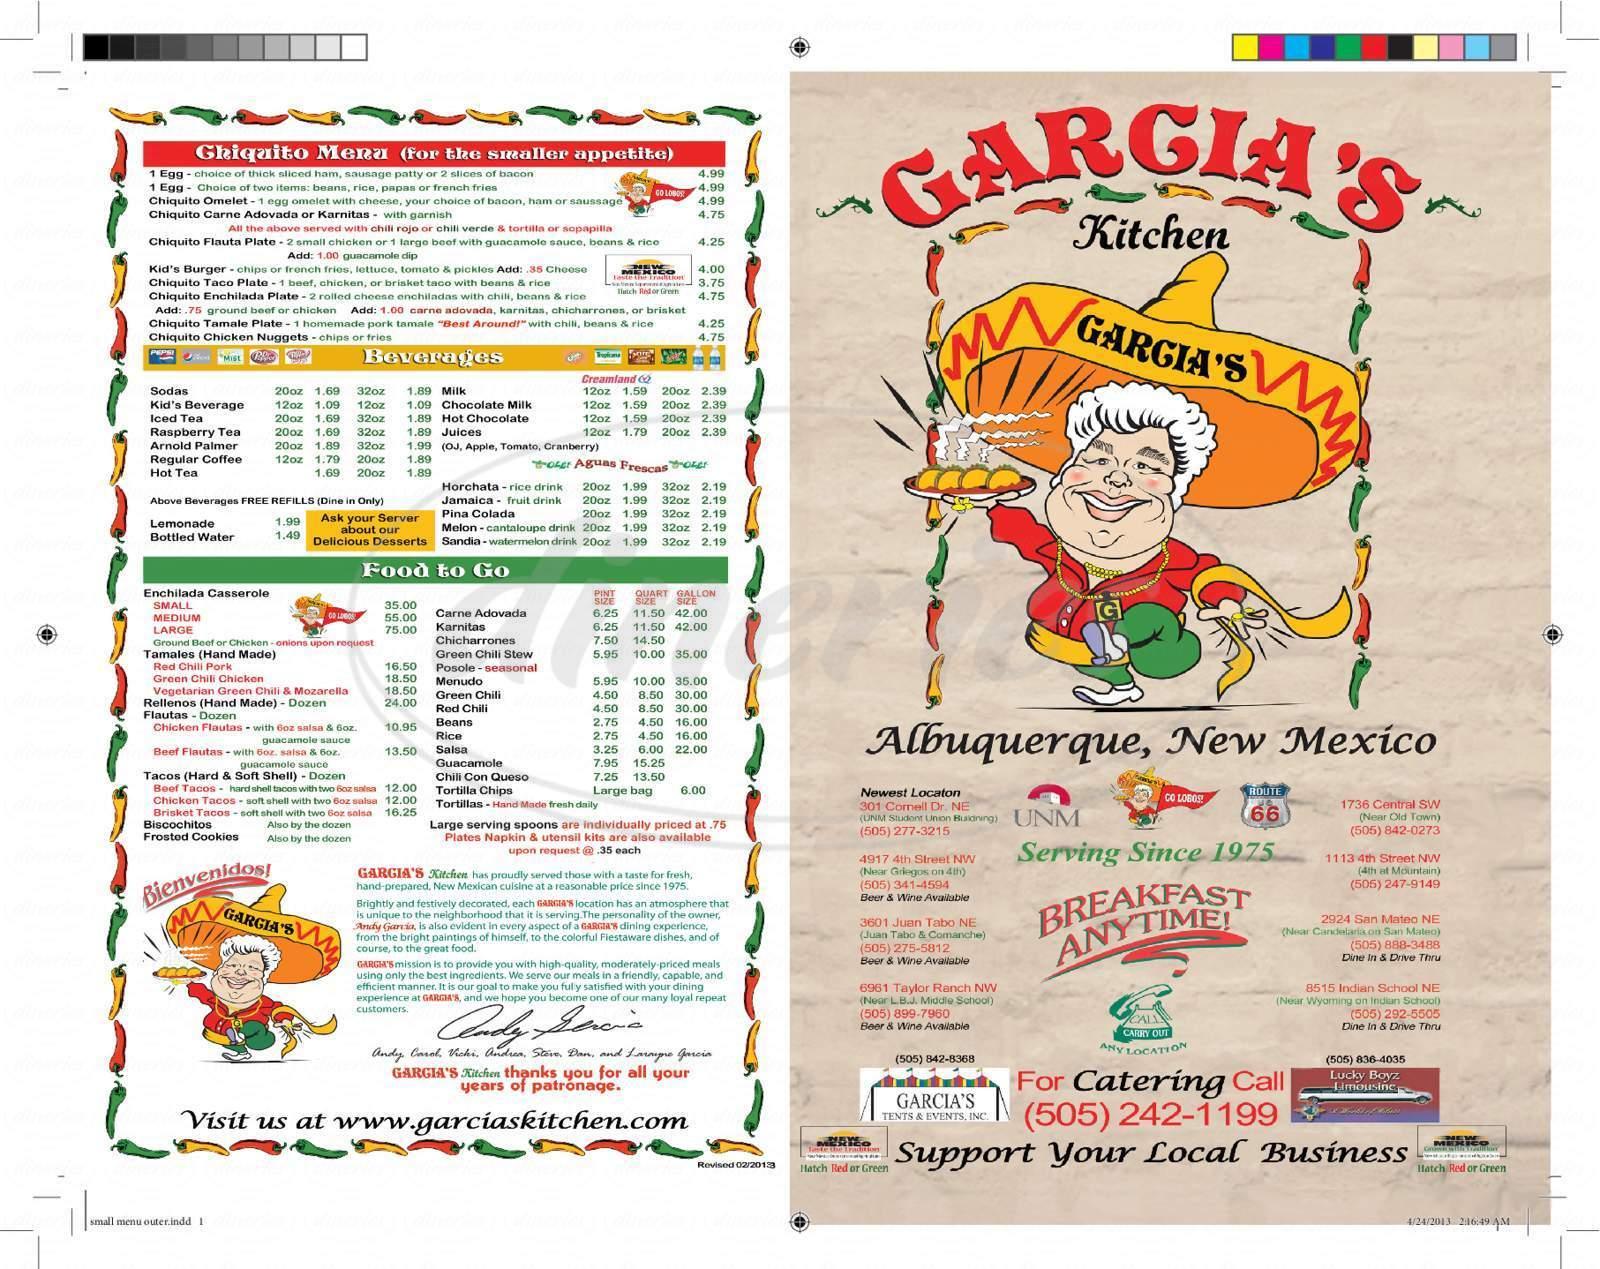 menu for The Original Garcia's Kitchen